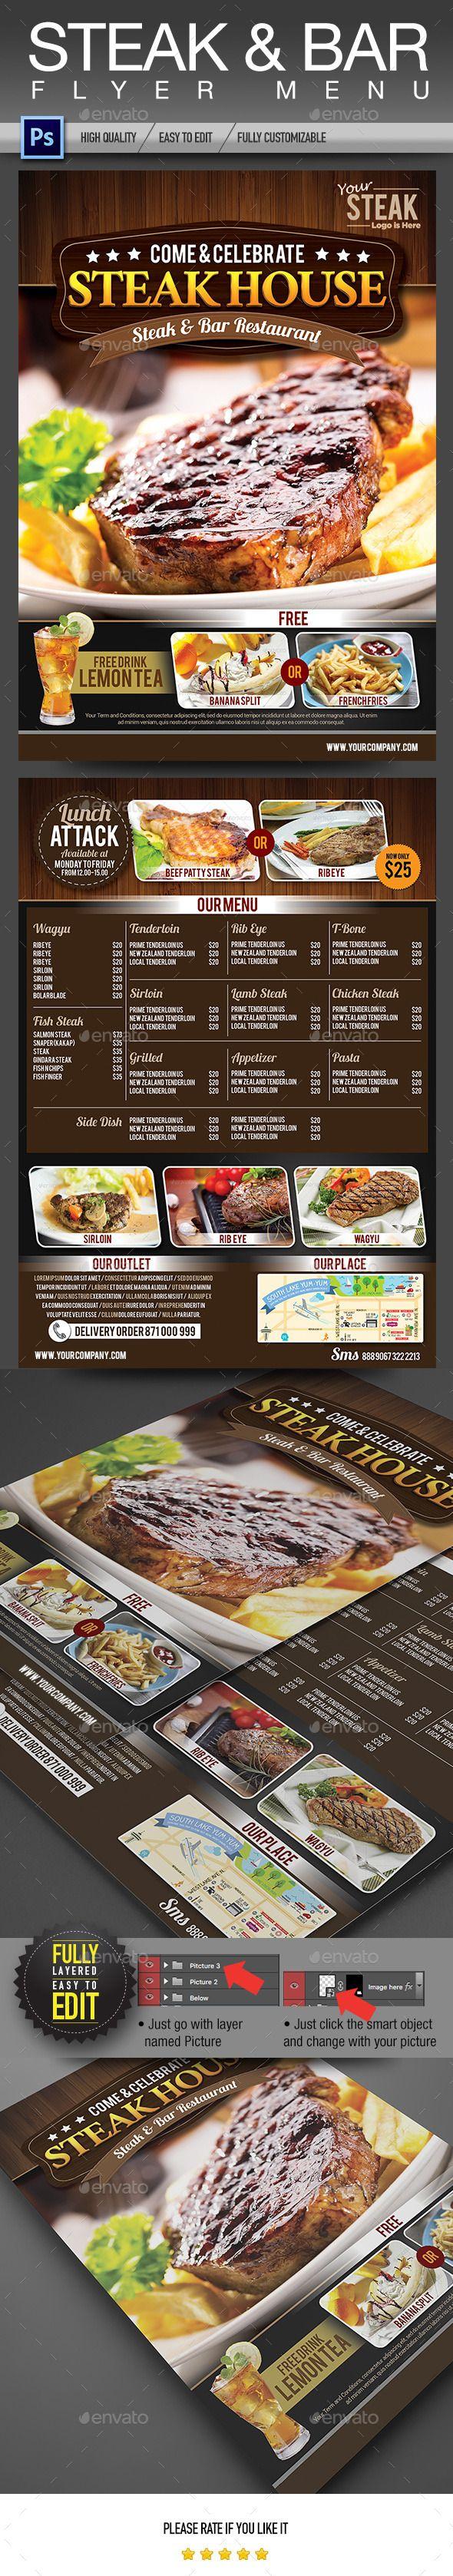 Steak & Bar Flyer Menu